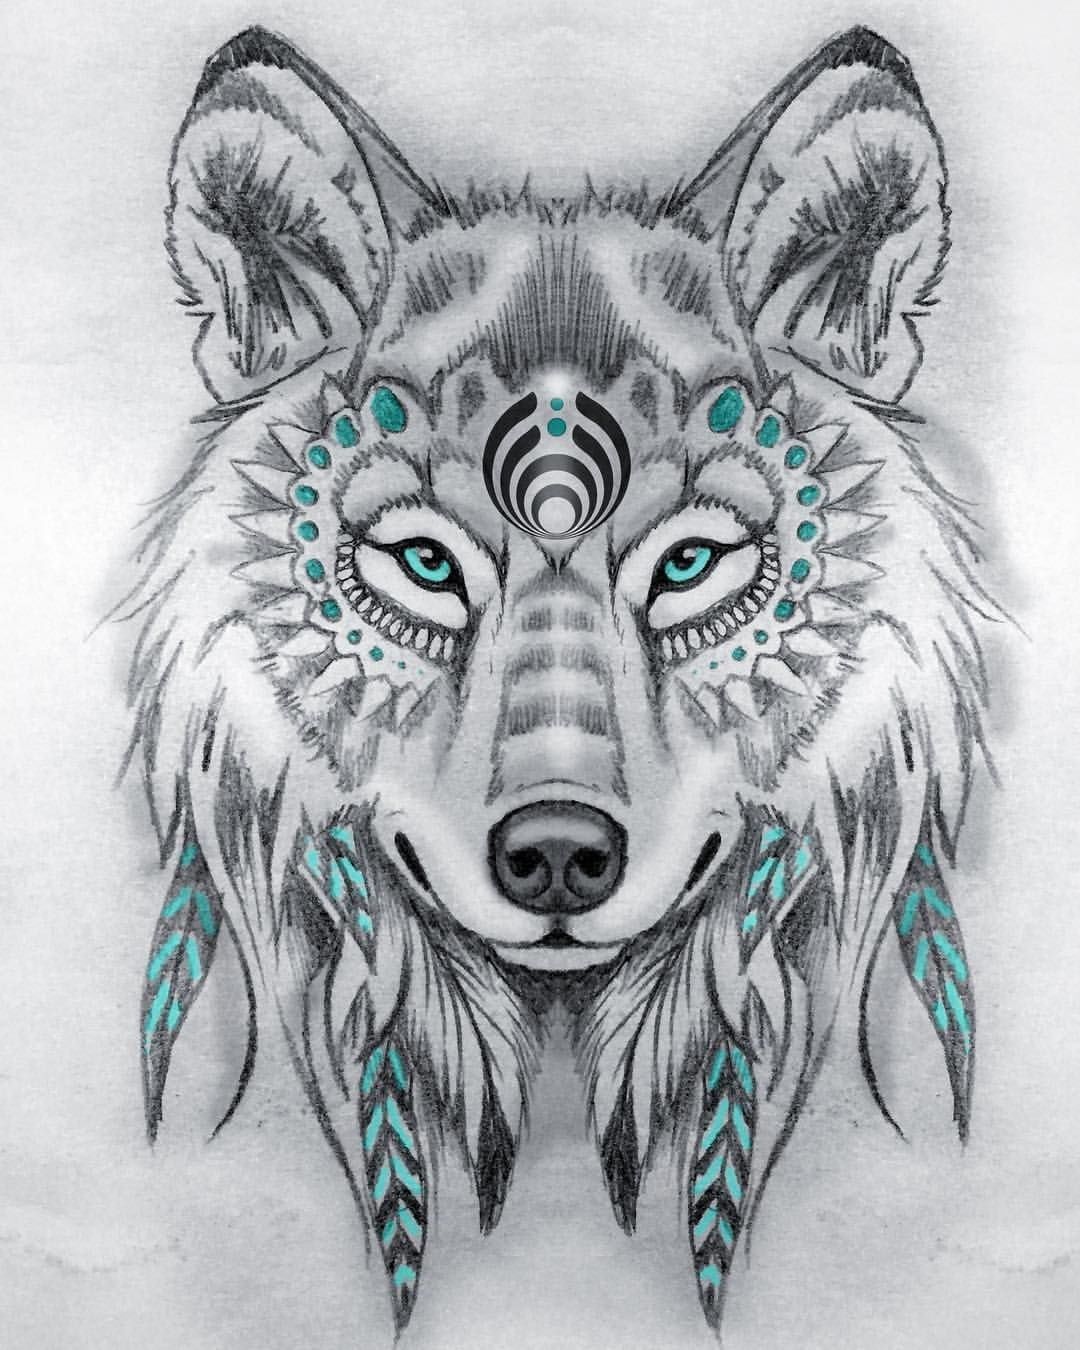 Alpha Of The North Wolf Wolftattoo Wolftattoos Wolfdesign Dog Art Artist Details Drawing Sketch T Wolf Sketch Sketches Wolf Tattoo Design